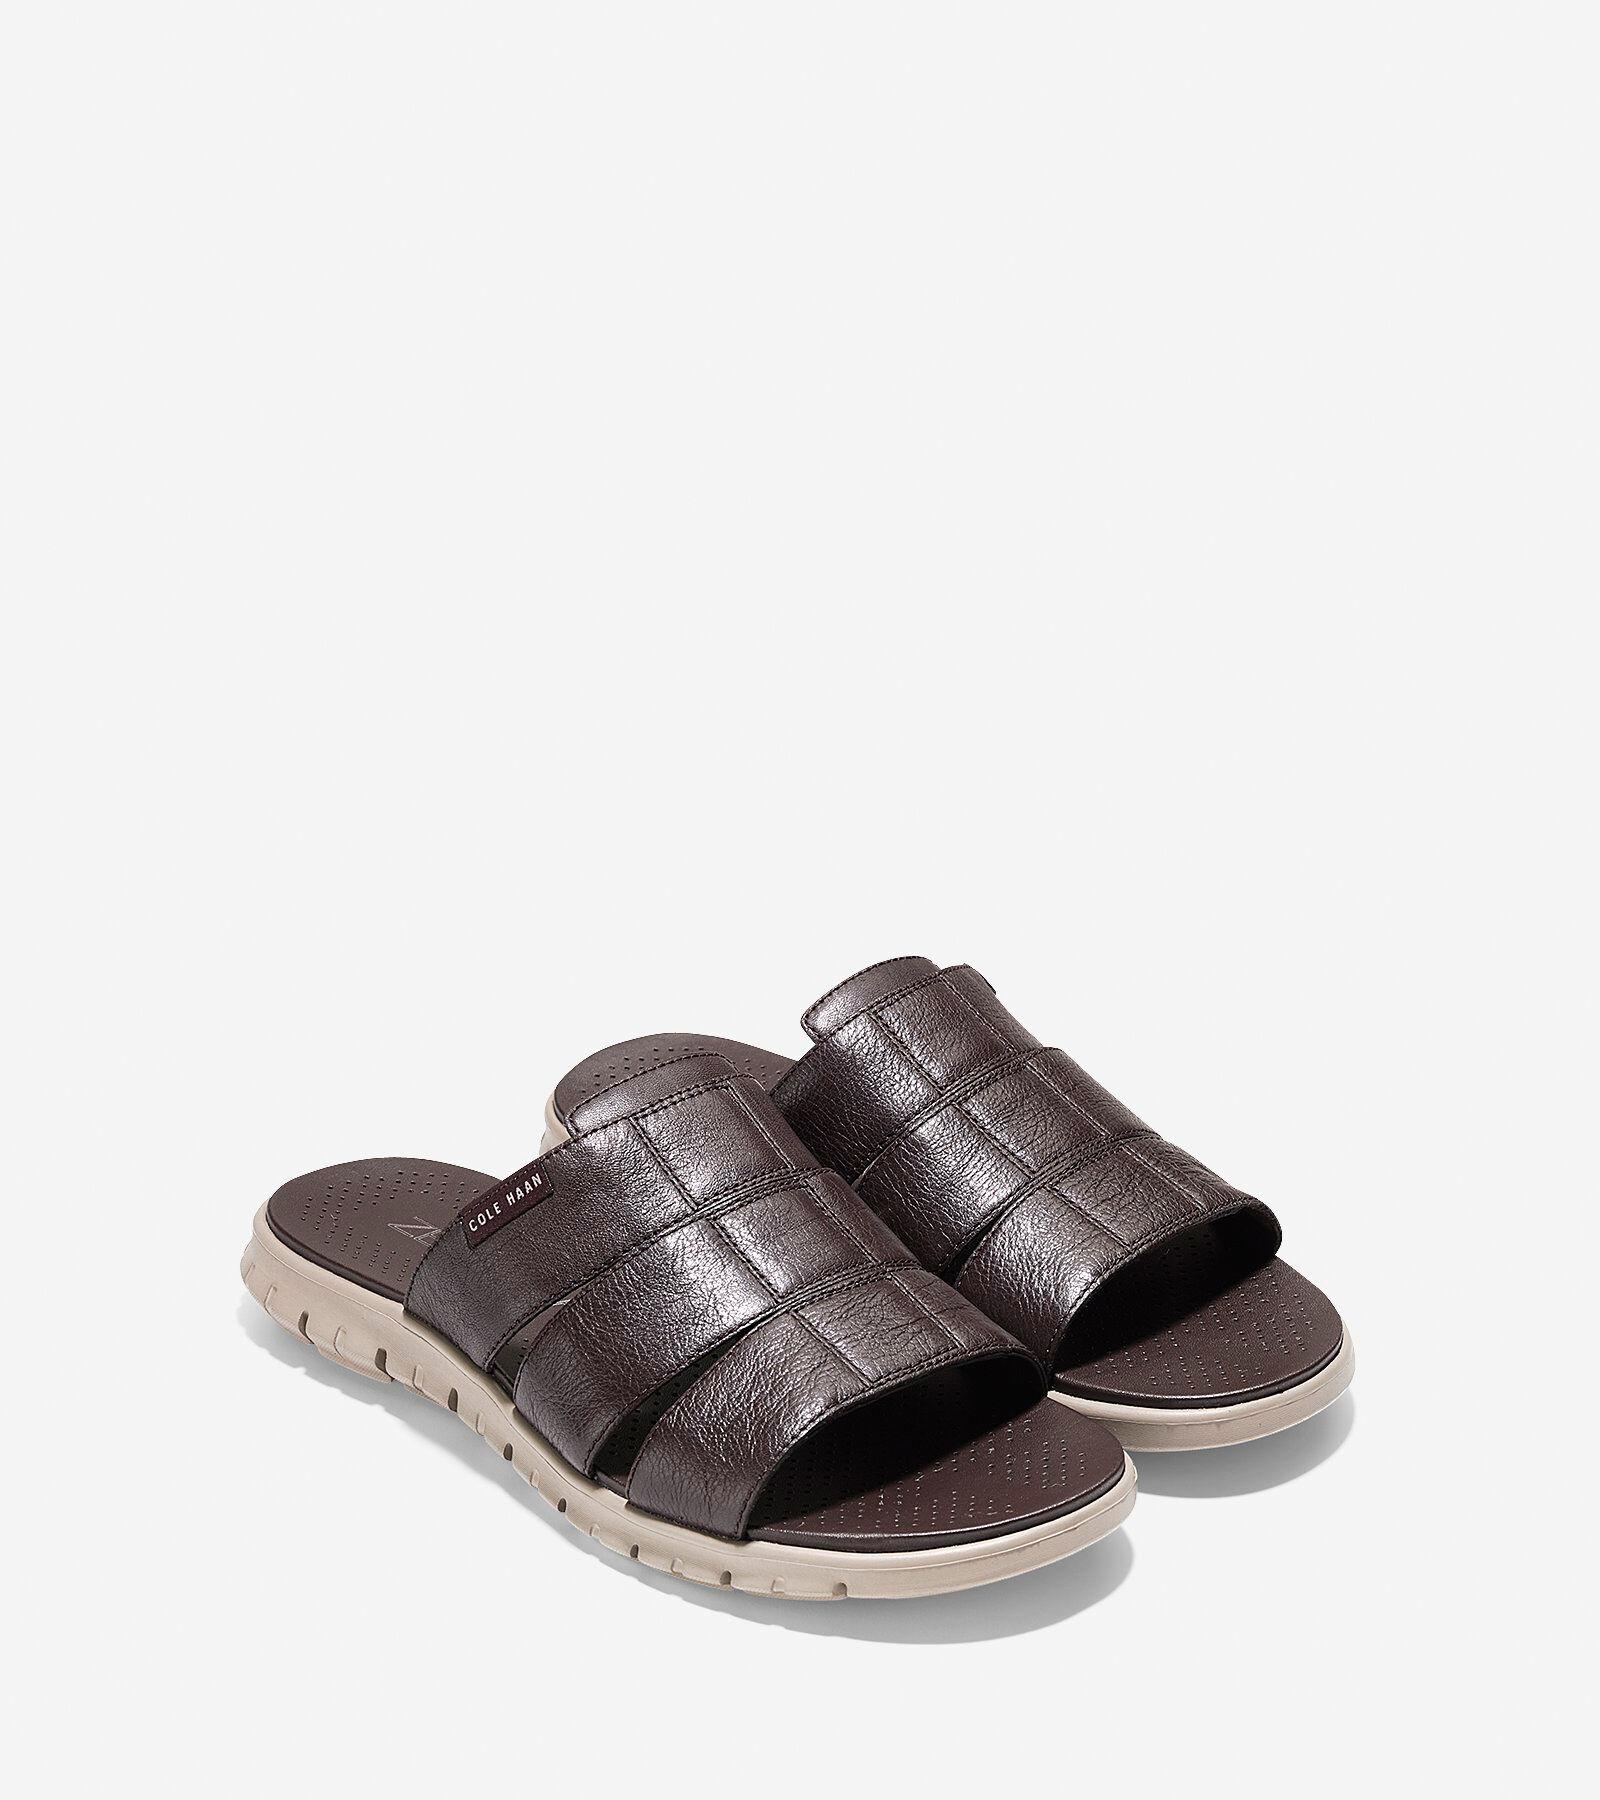 ... ZERØGRAND 3 Strap Slide Sandal; ZERØGRAND 3 Strap Slide Sandal. # colehaan